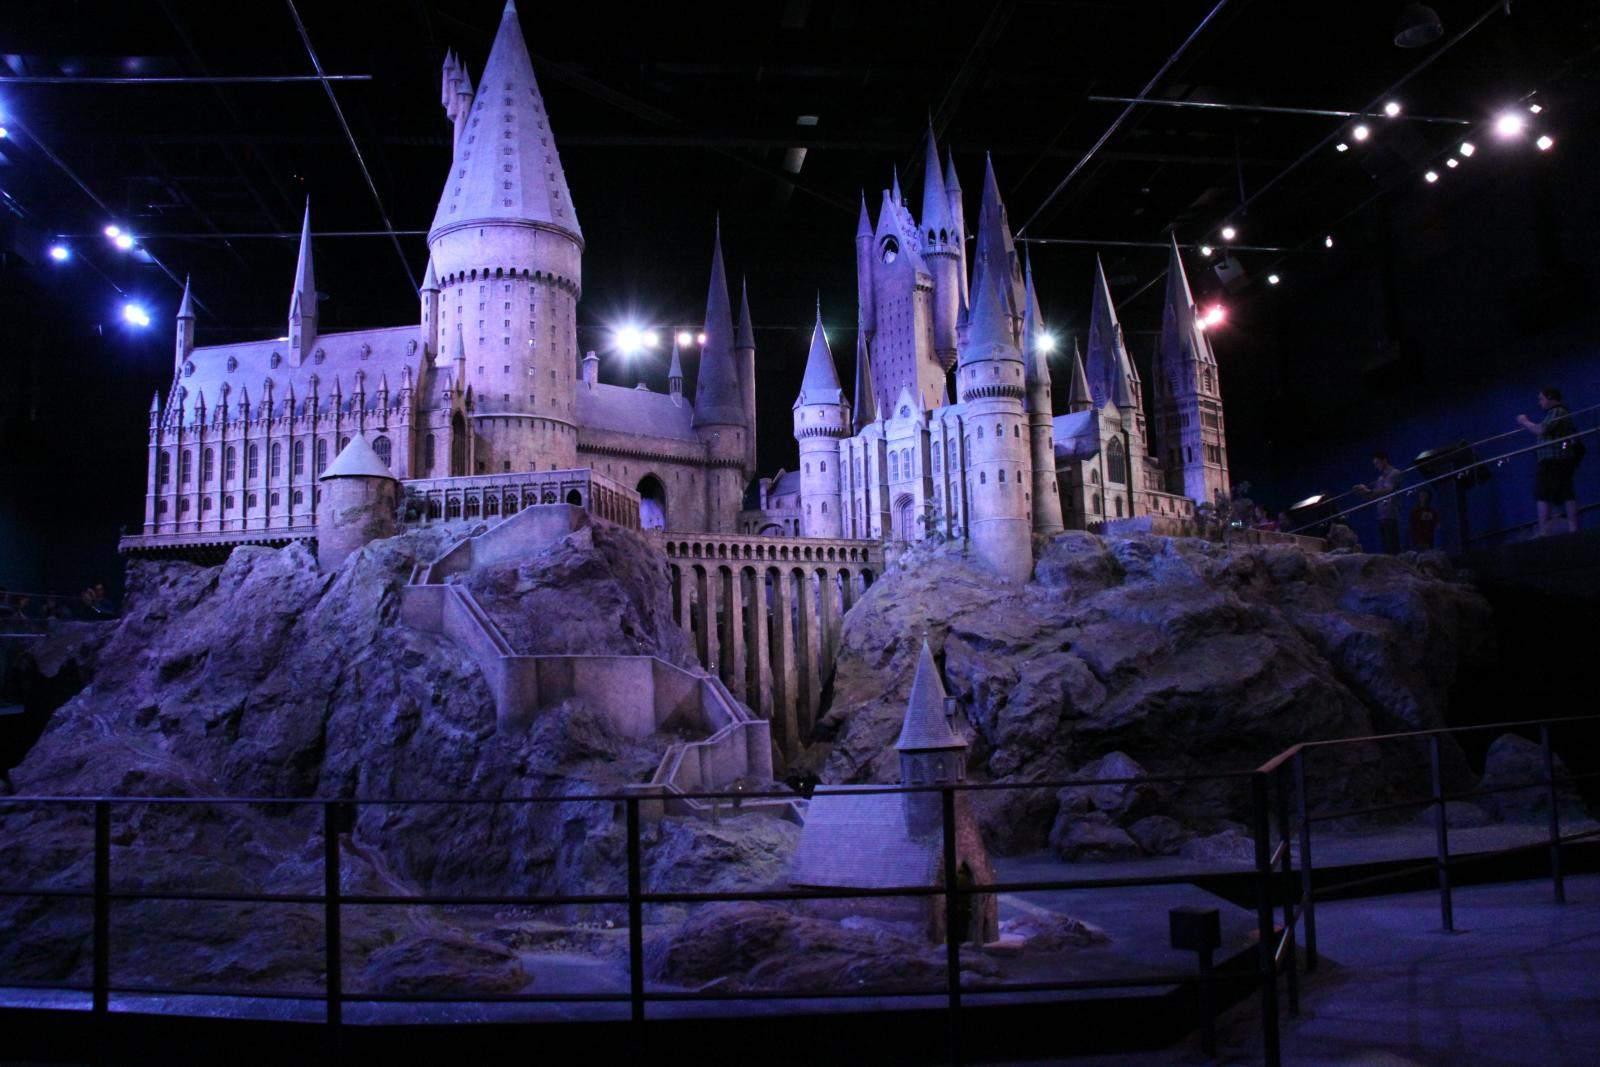 making harry potter7 The Making of Harry Potter, Warner Bros Studio London